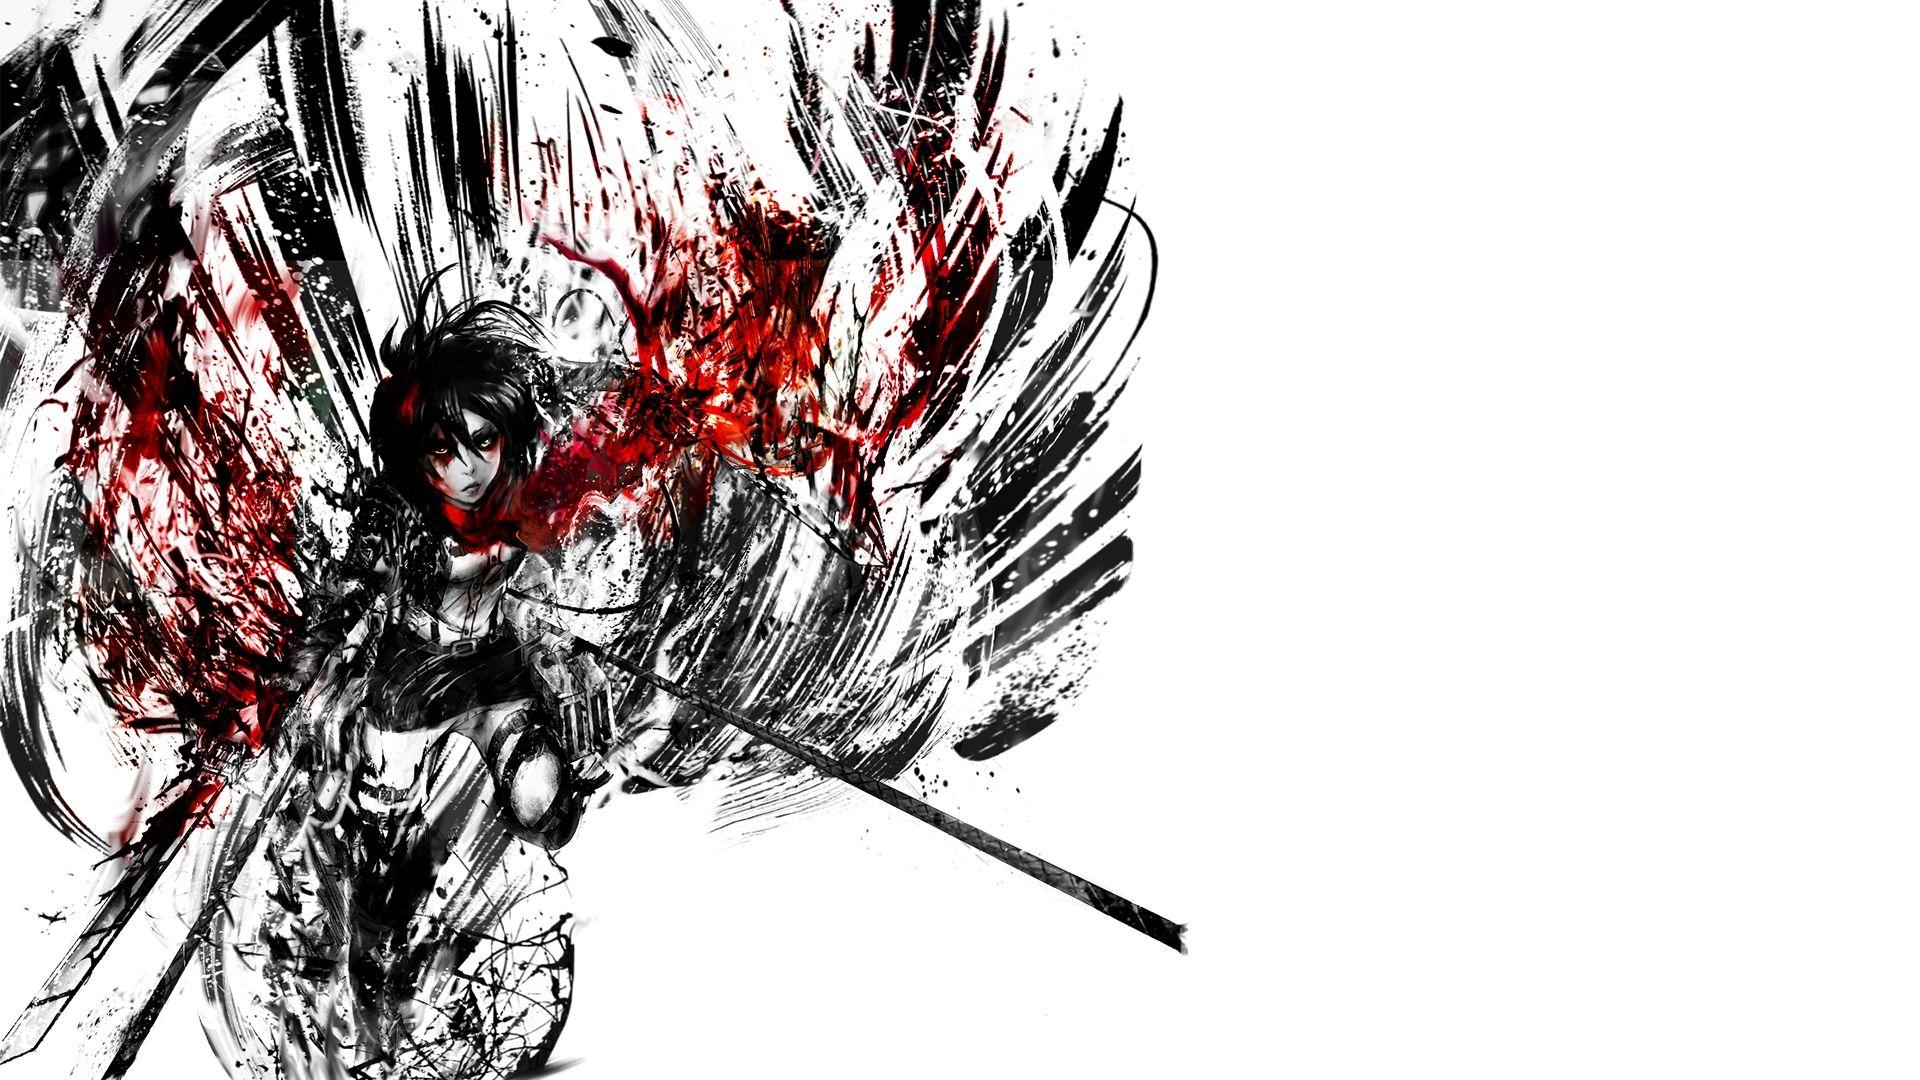 Anime Attack On Titan Mikasa Wallpaper Anime Wallpapers